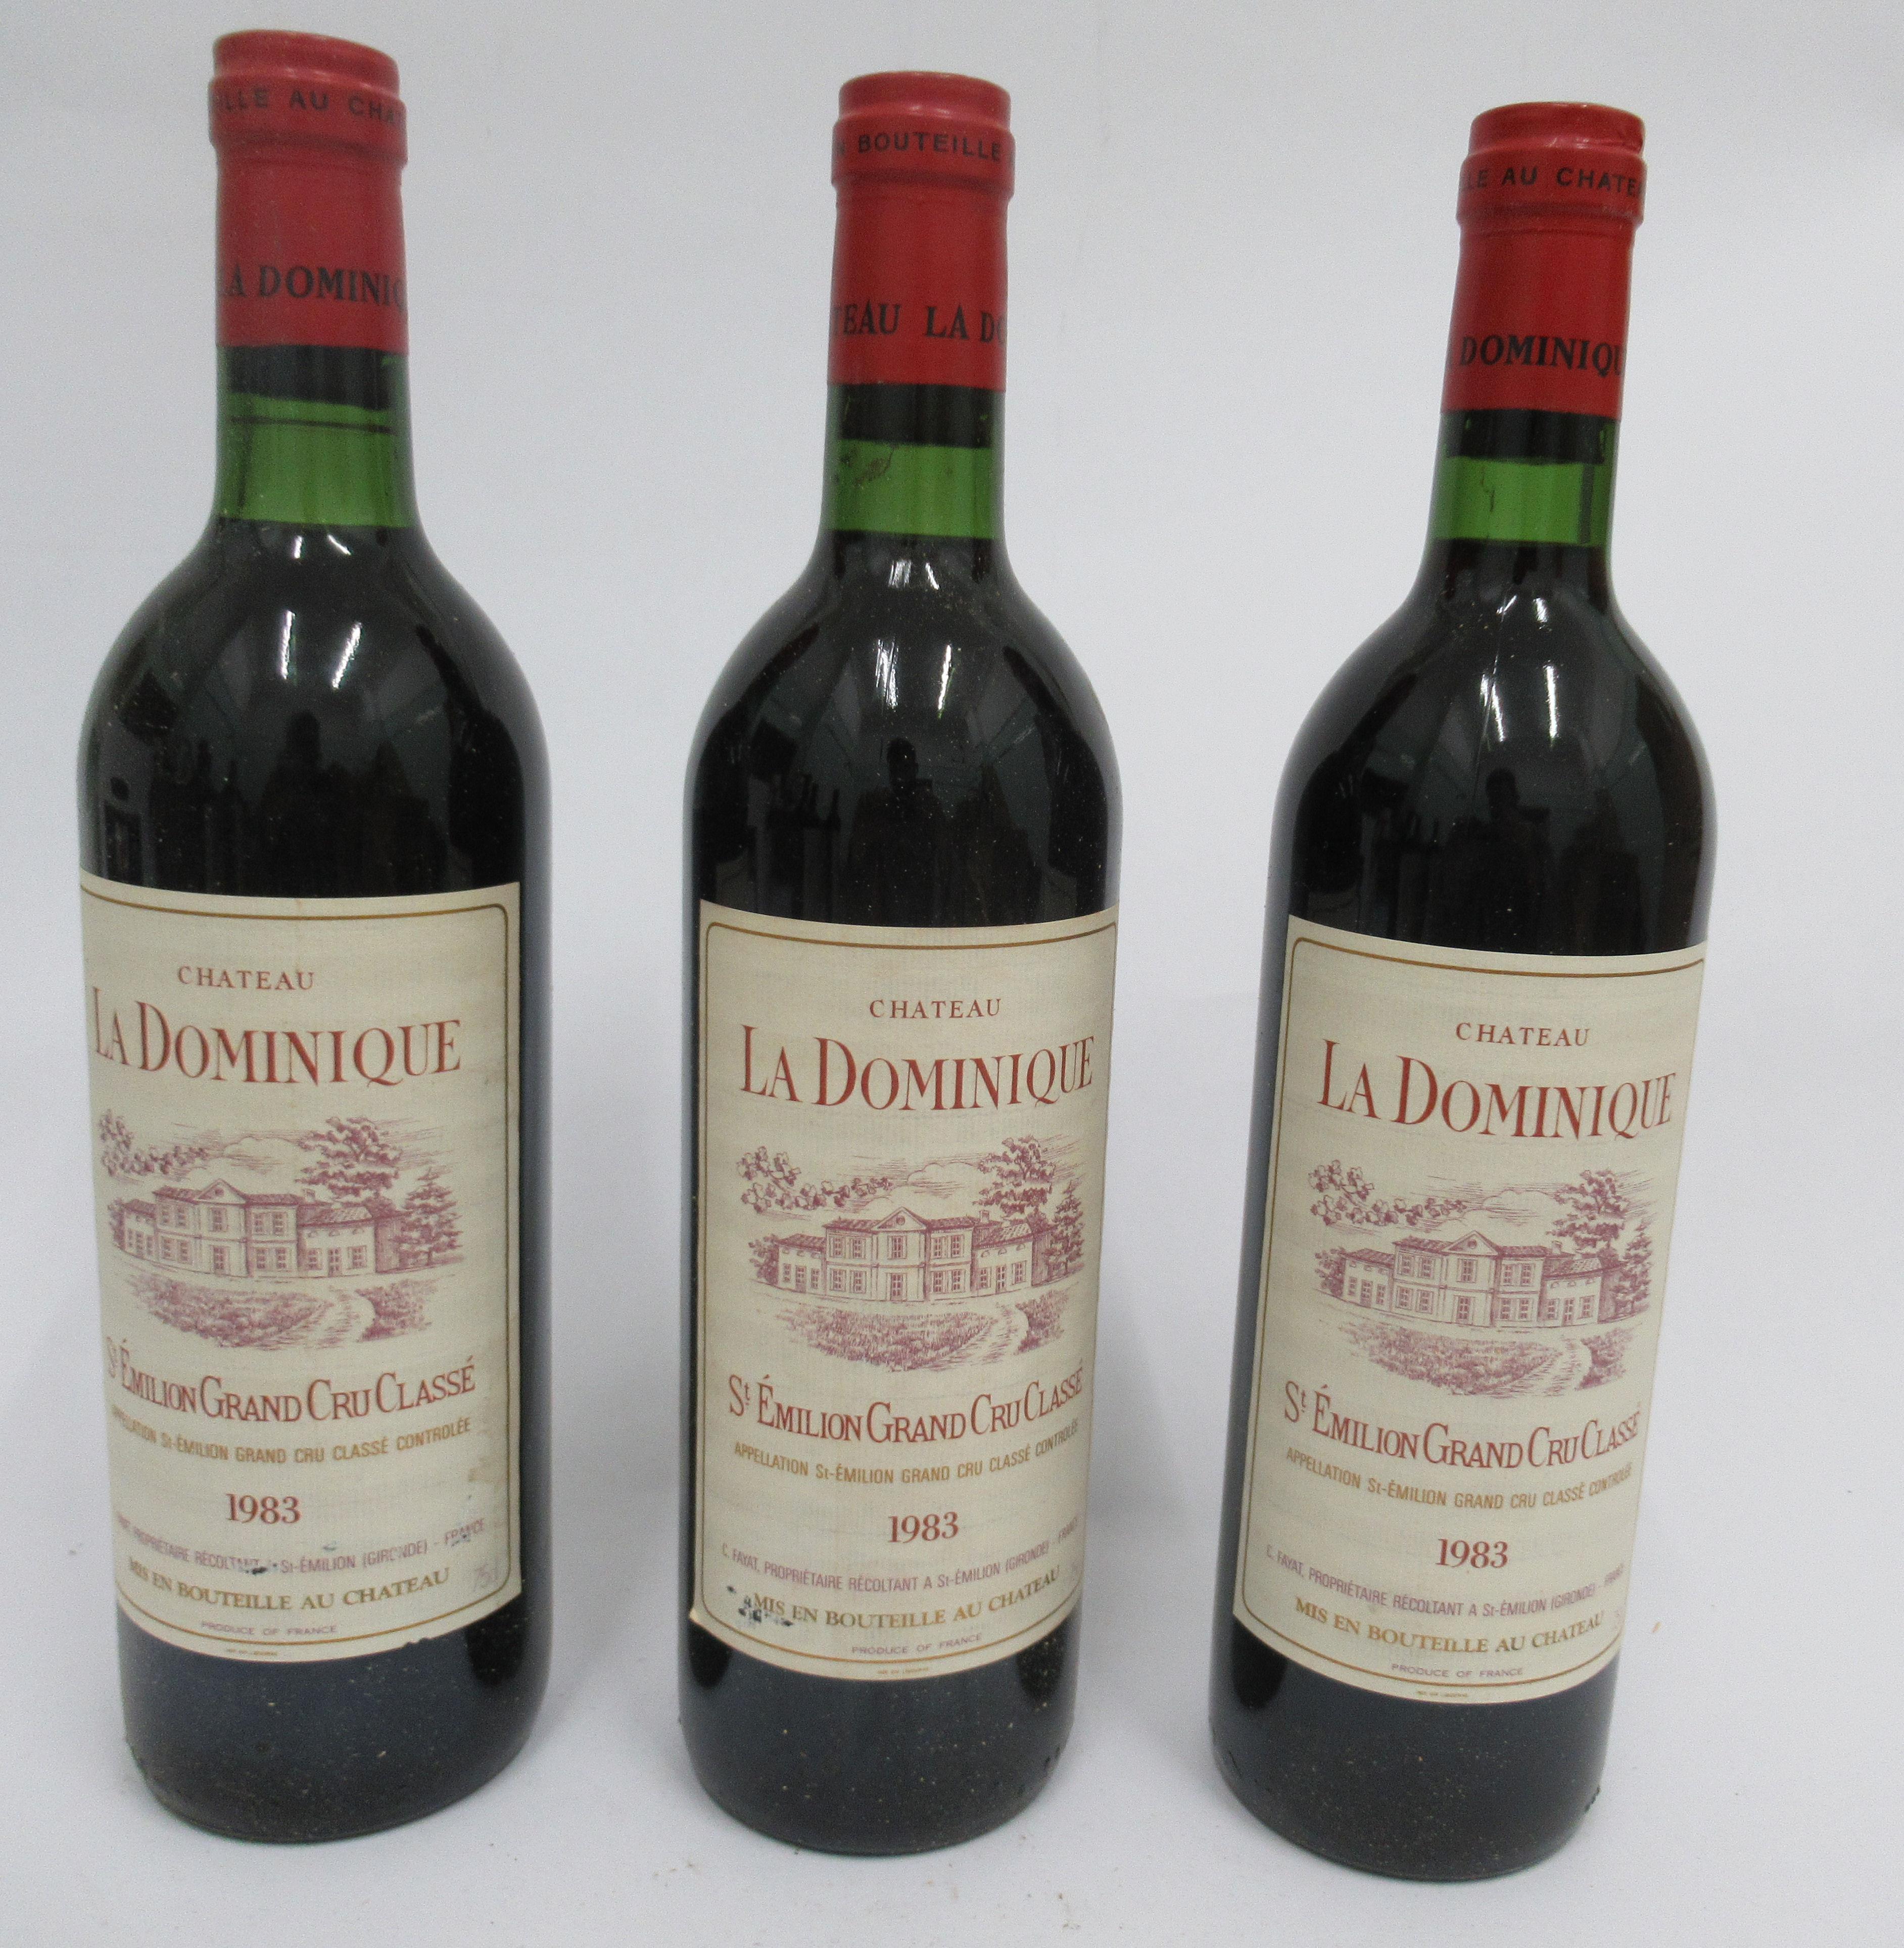 Wine, six bottles of 1983 Chateau La Dominique Grand Cru Classe - Image 2 of 4